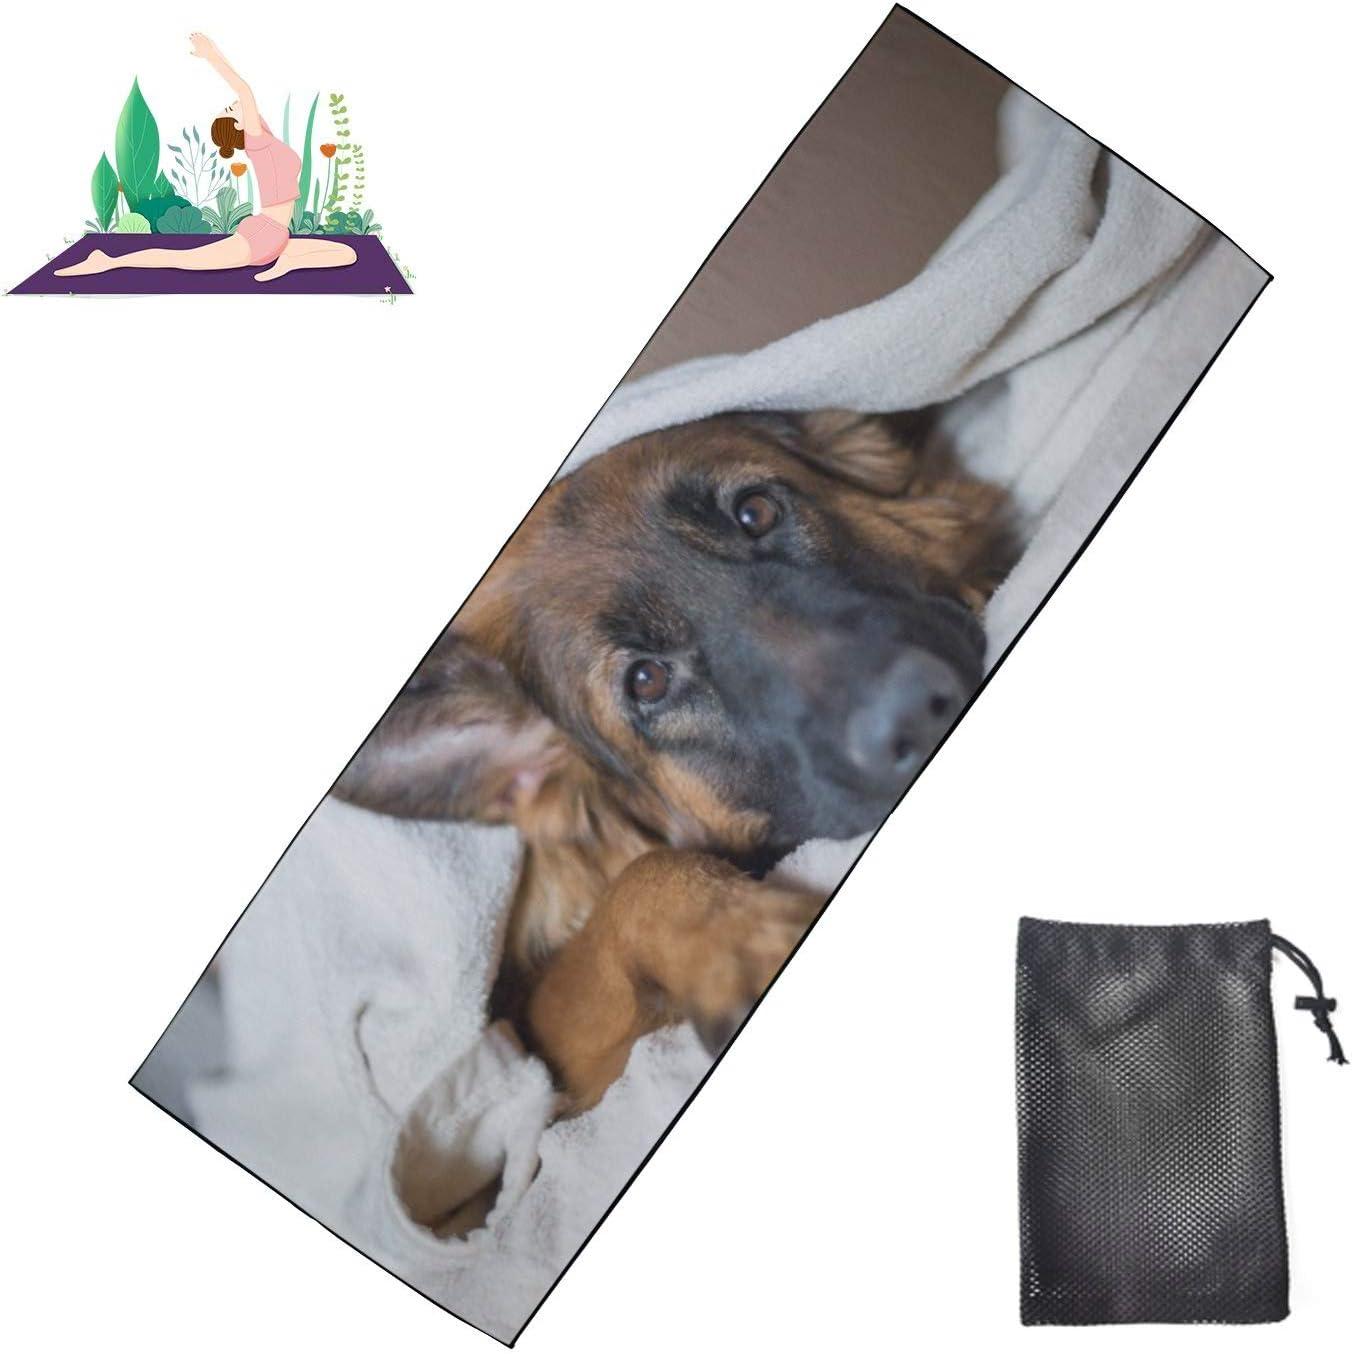 Huqalh Max 90% OFF Yoga Floor Mat Cute German Shepherd P On Bed A Blanket in New color